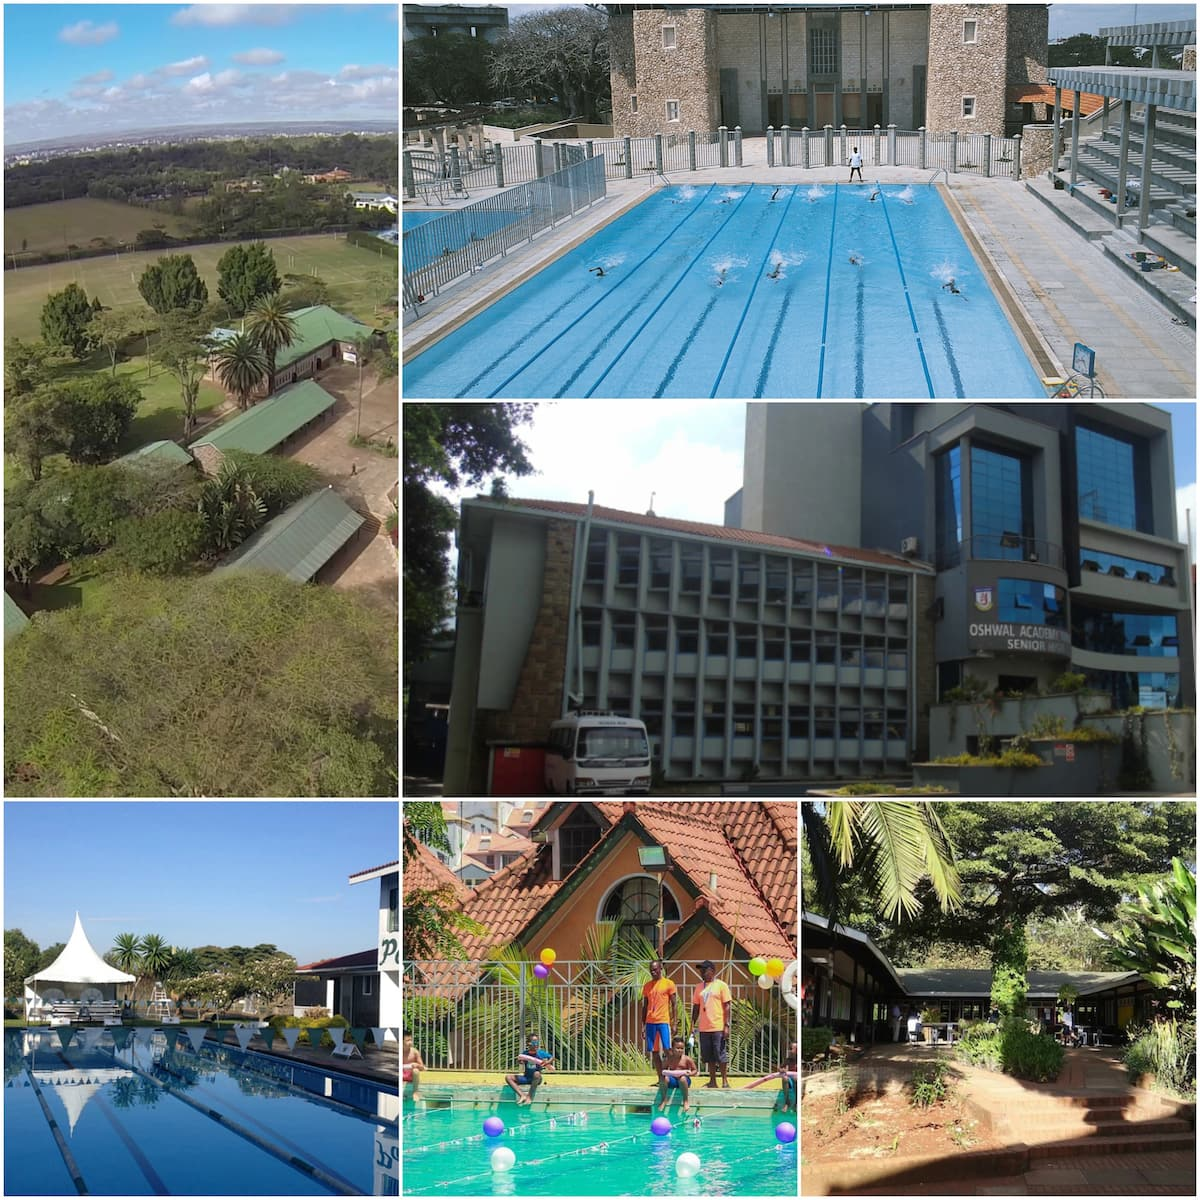 Cheapest IGCSE schools in Kenya